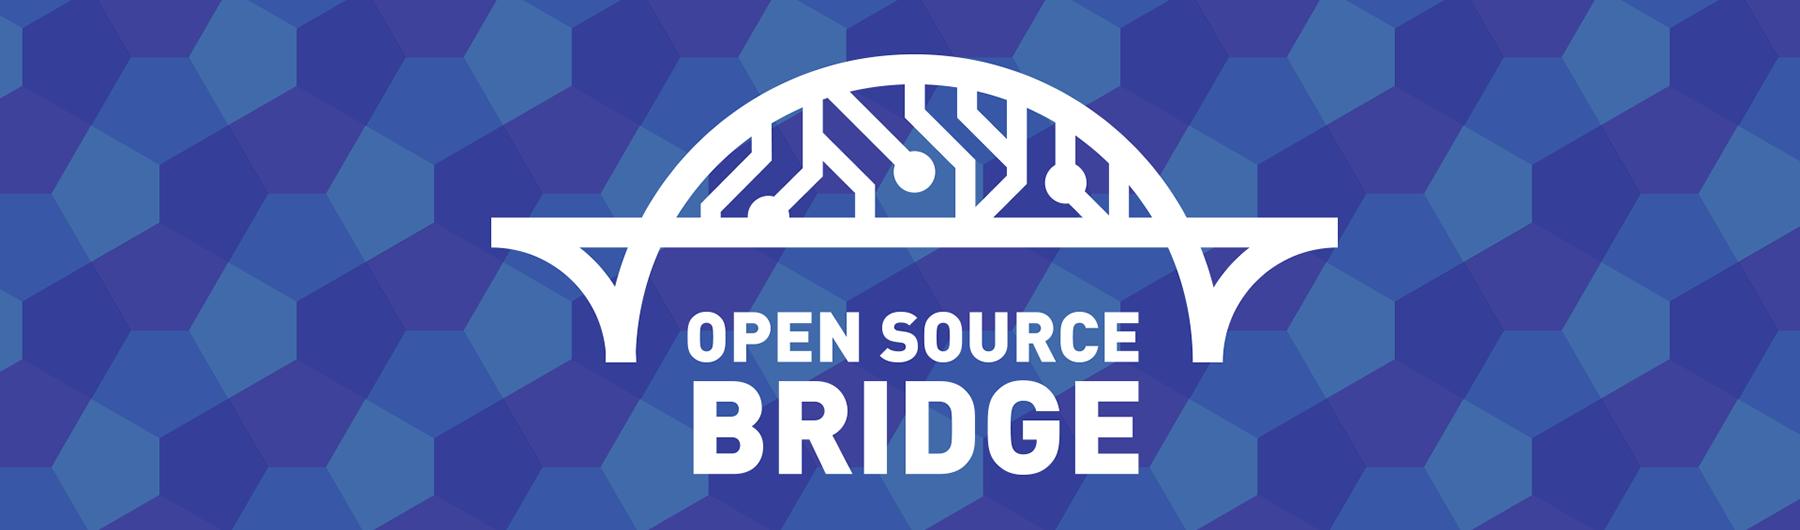 Open Source Bridge 10 Year Celebration